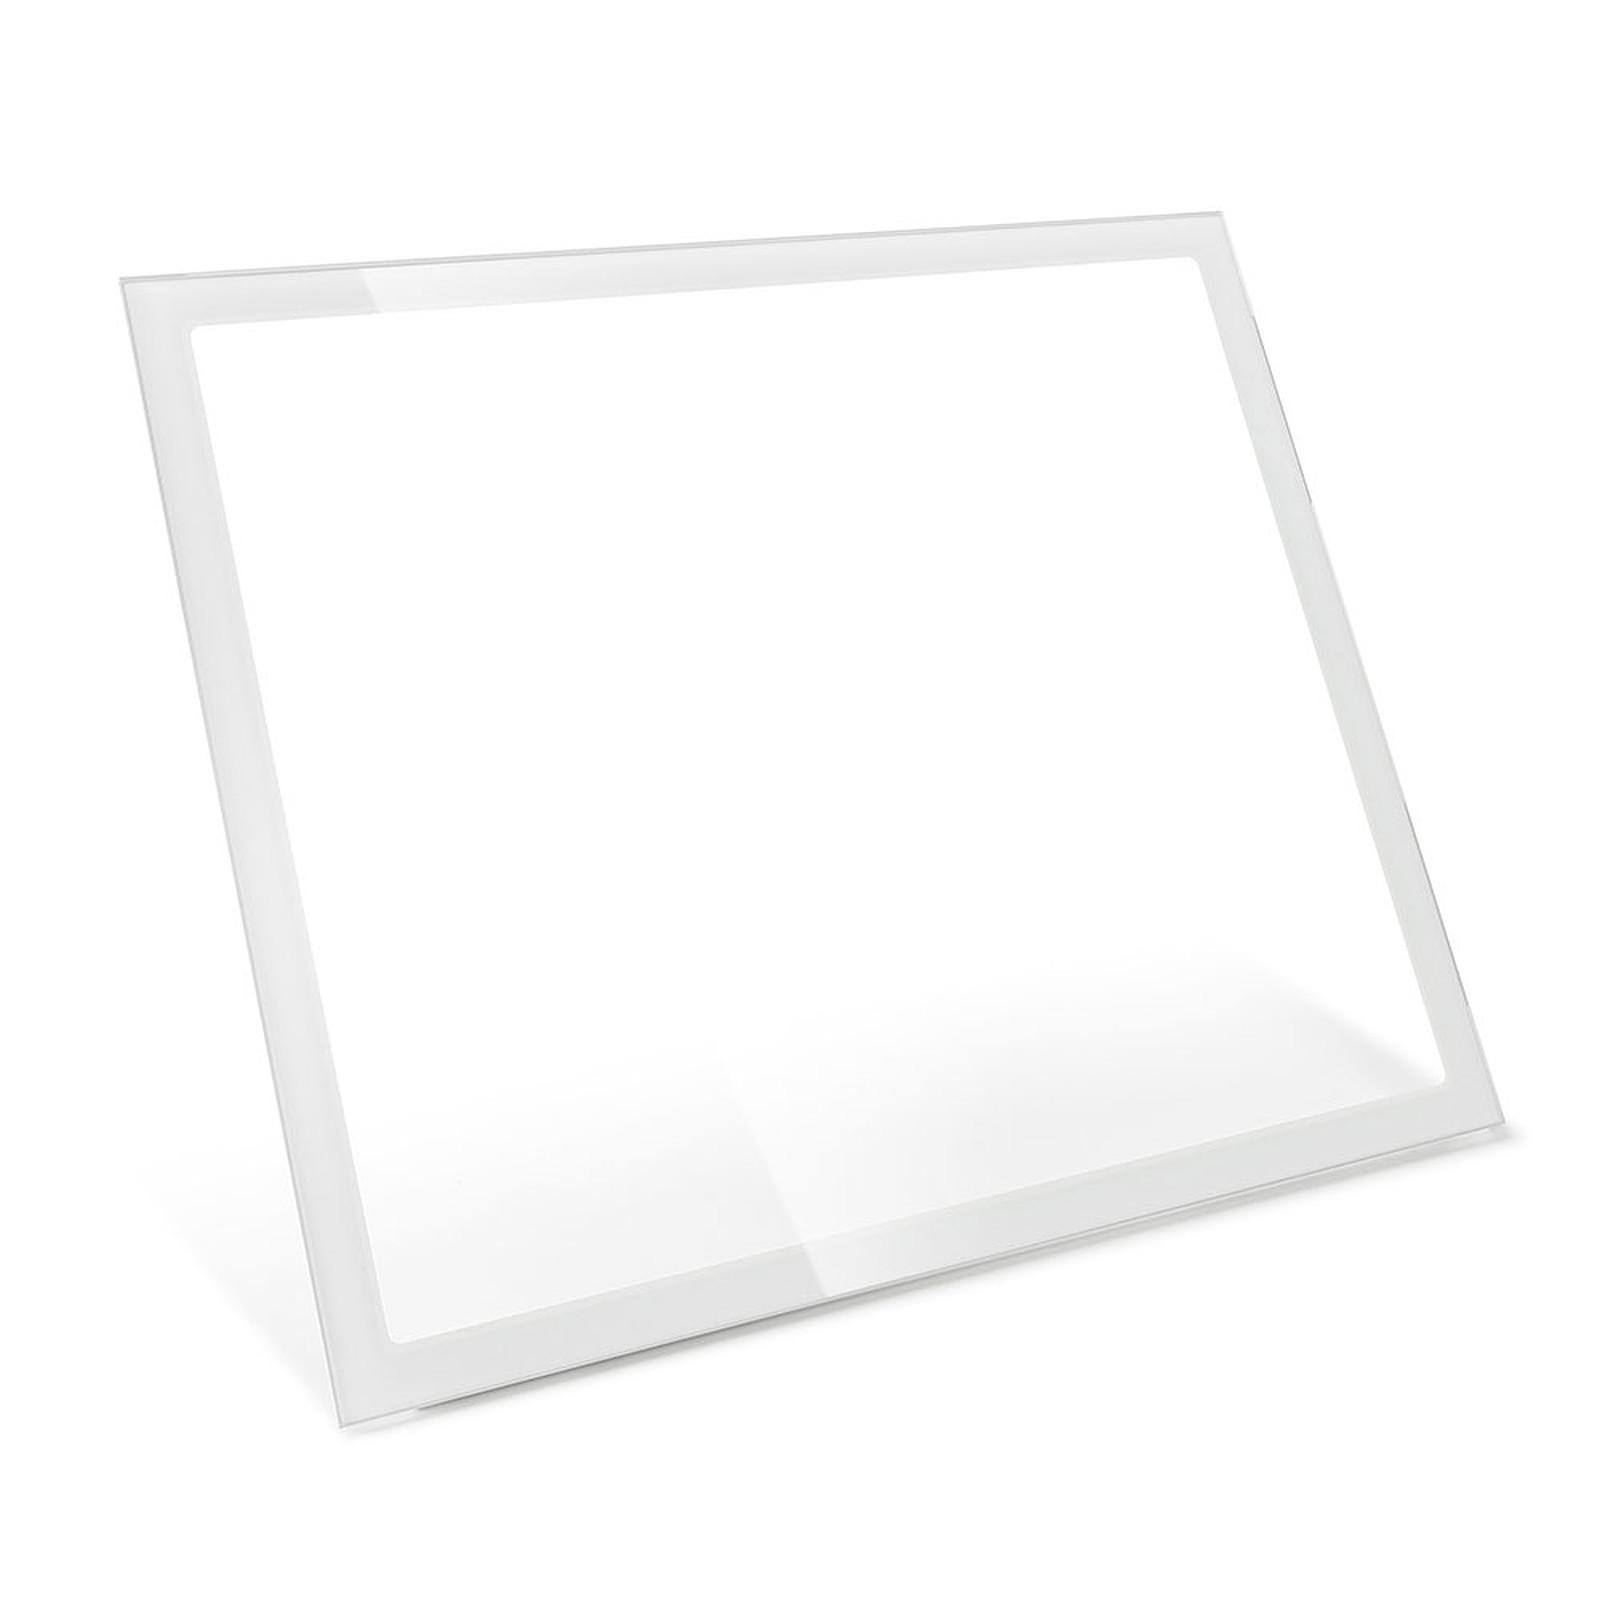 Fractal Design Define R6 TG Panneau latéral - Blanc